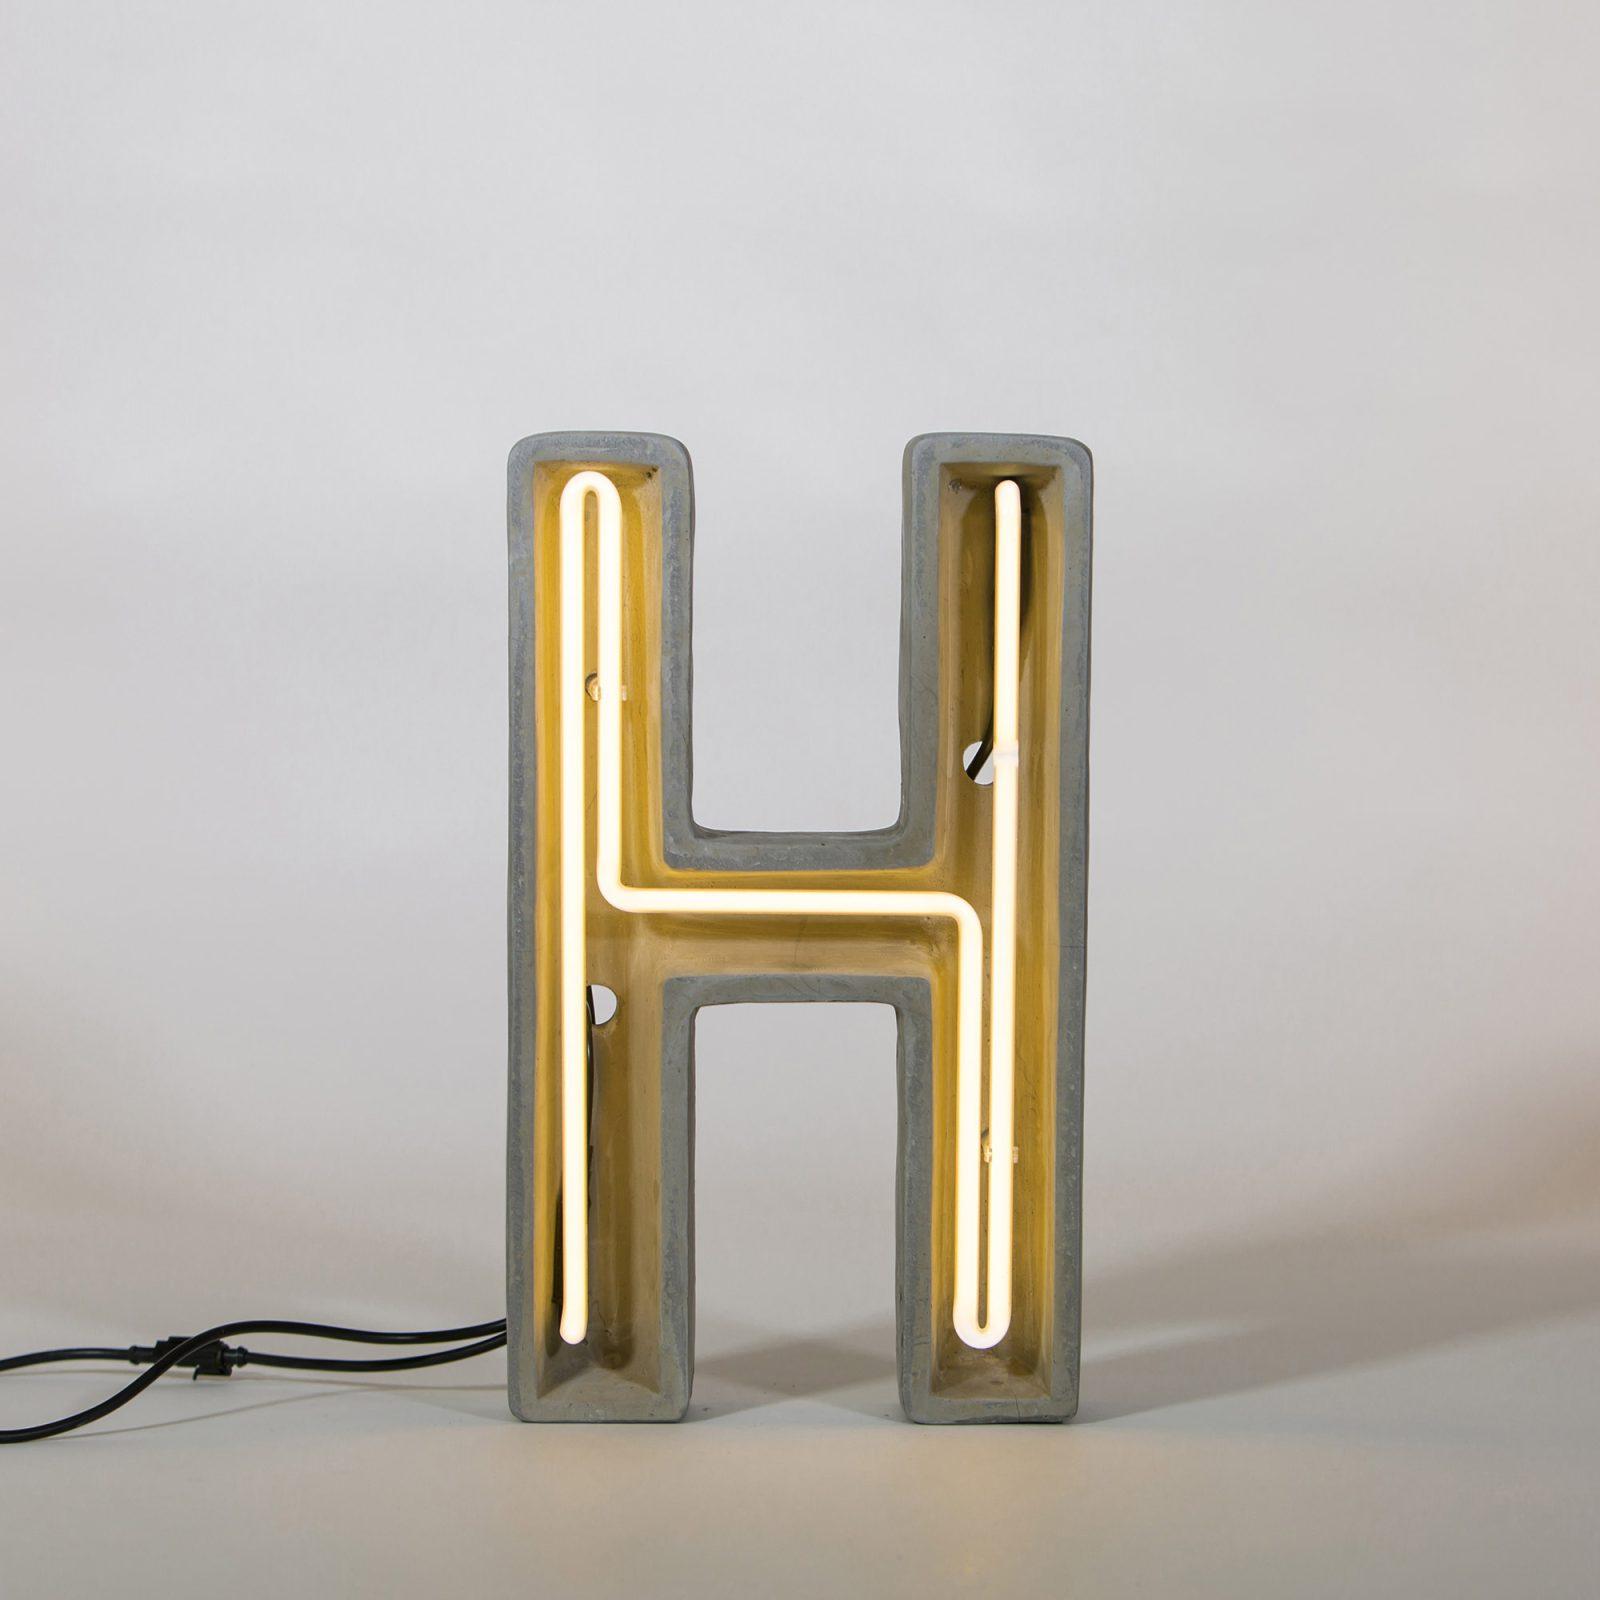 Alphacrete, Concrete Neon Light – H-32193